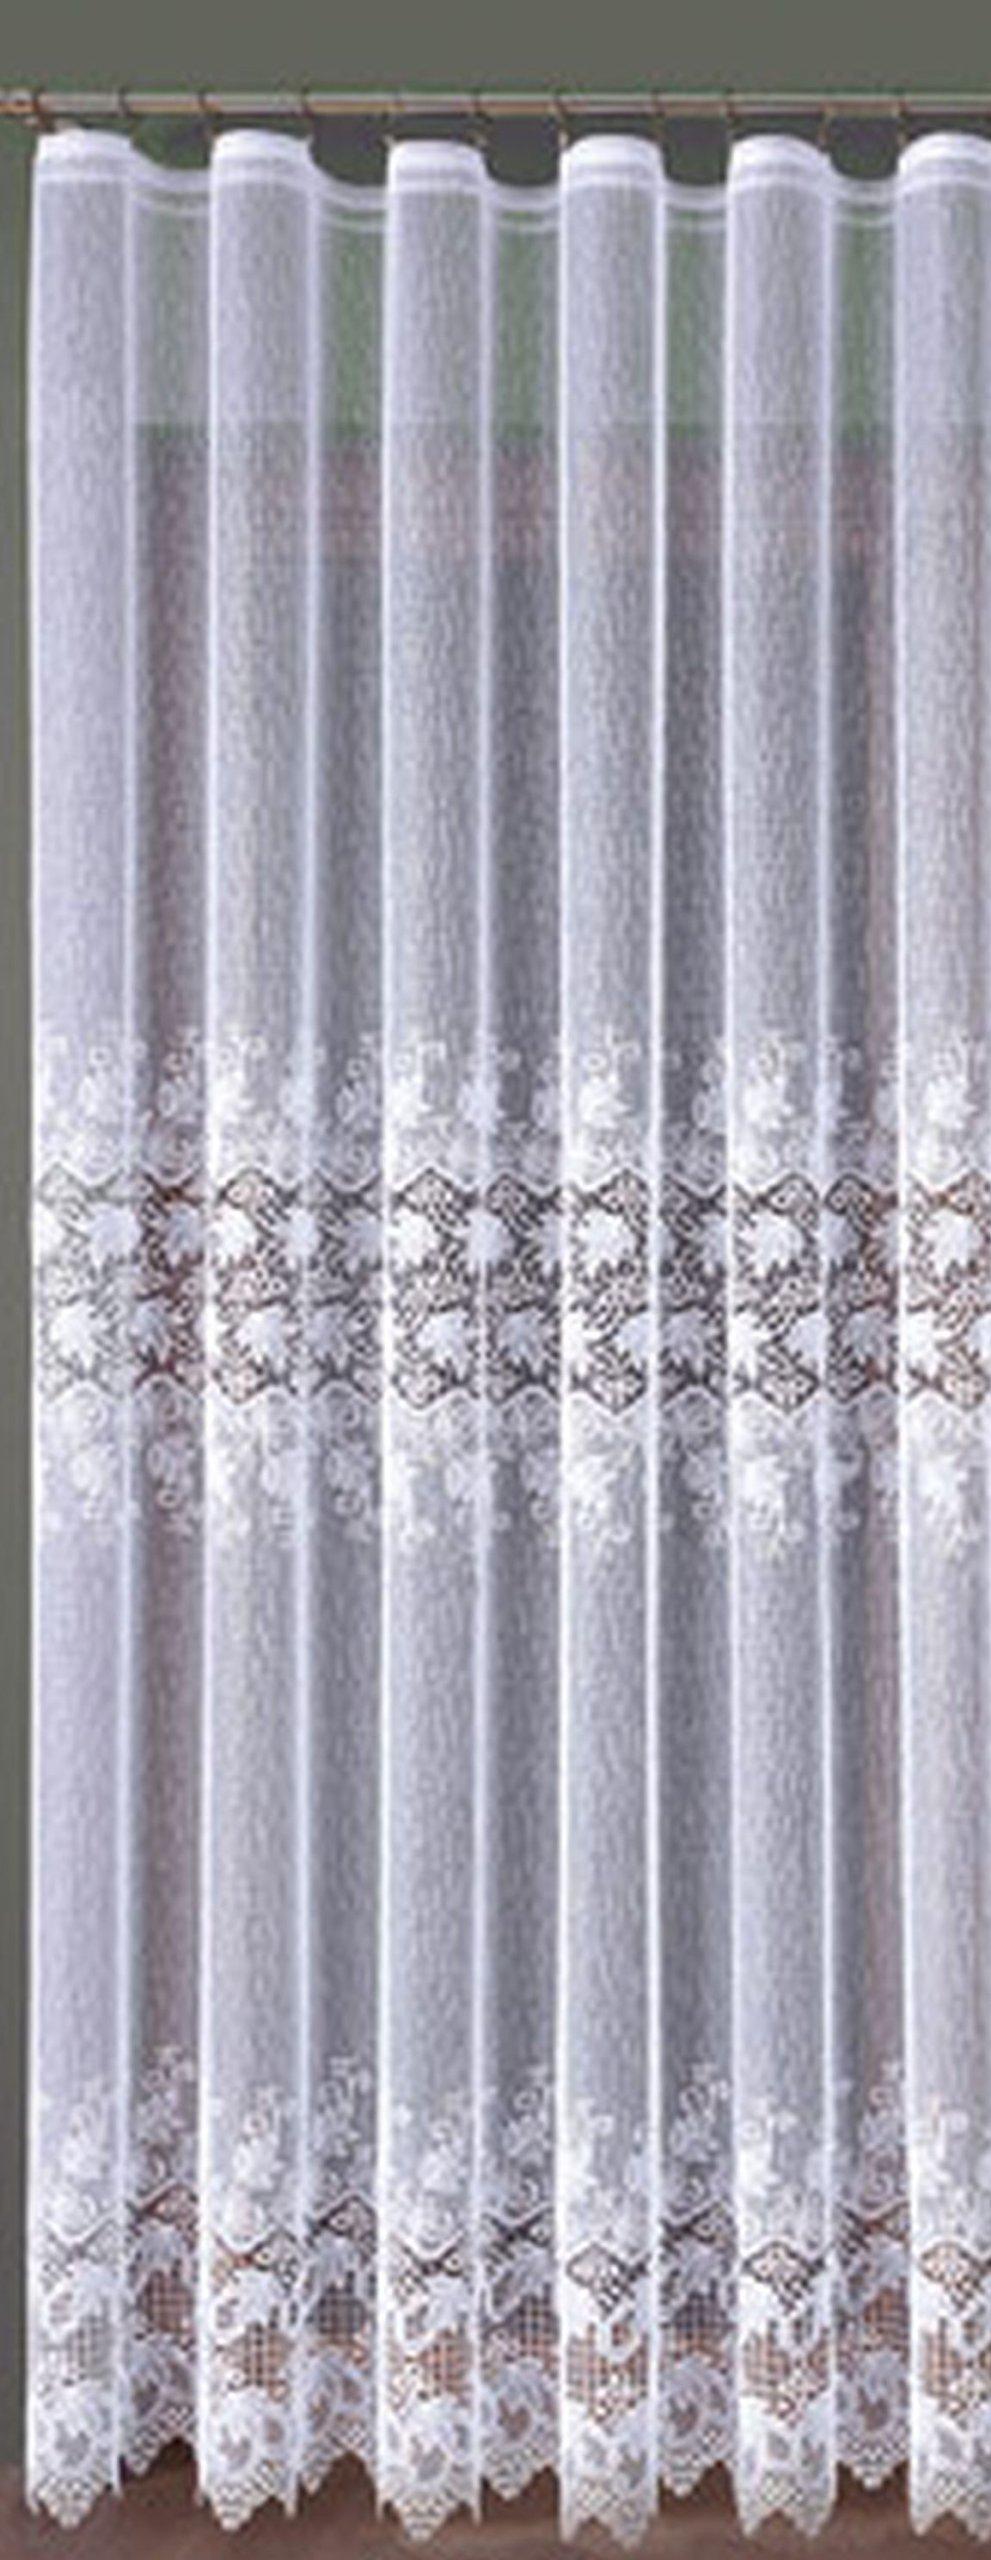 Firana Z Metra 250 Cm Firanki żakardowe 008984